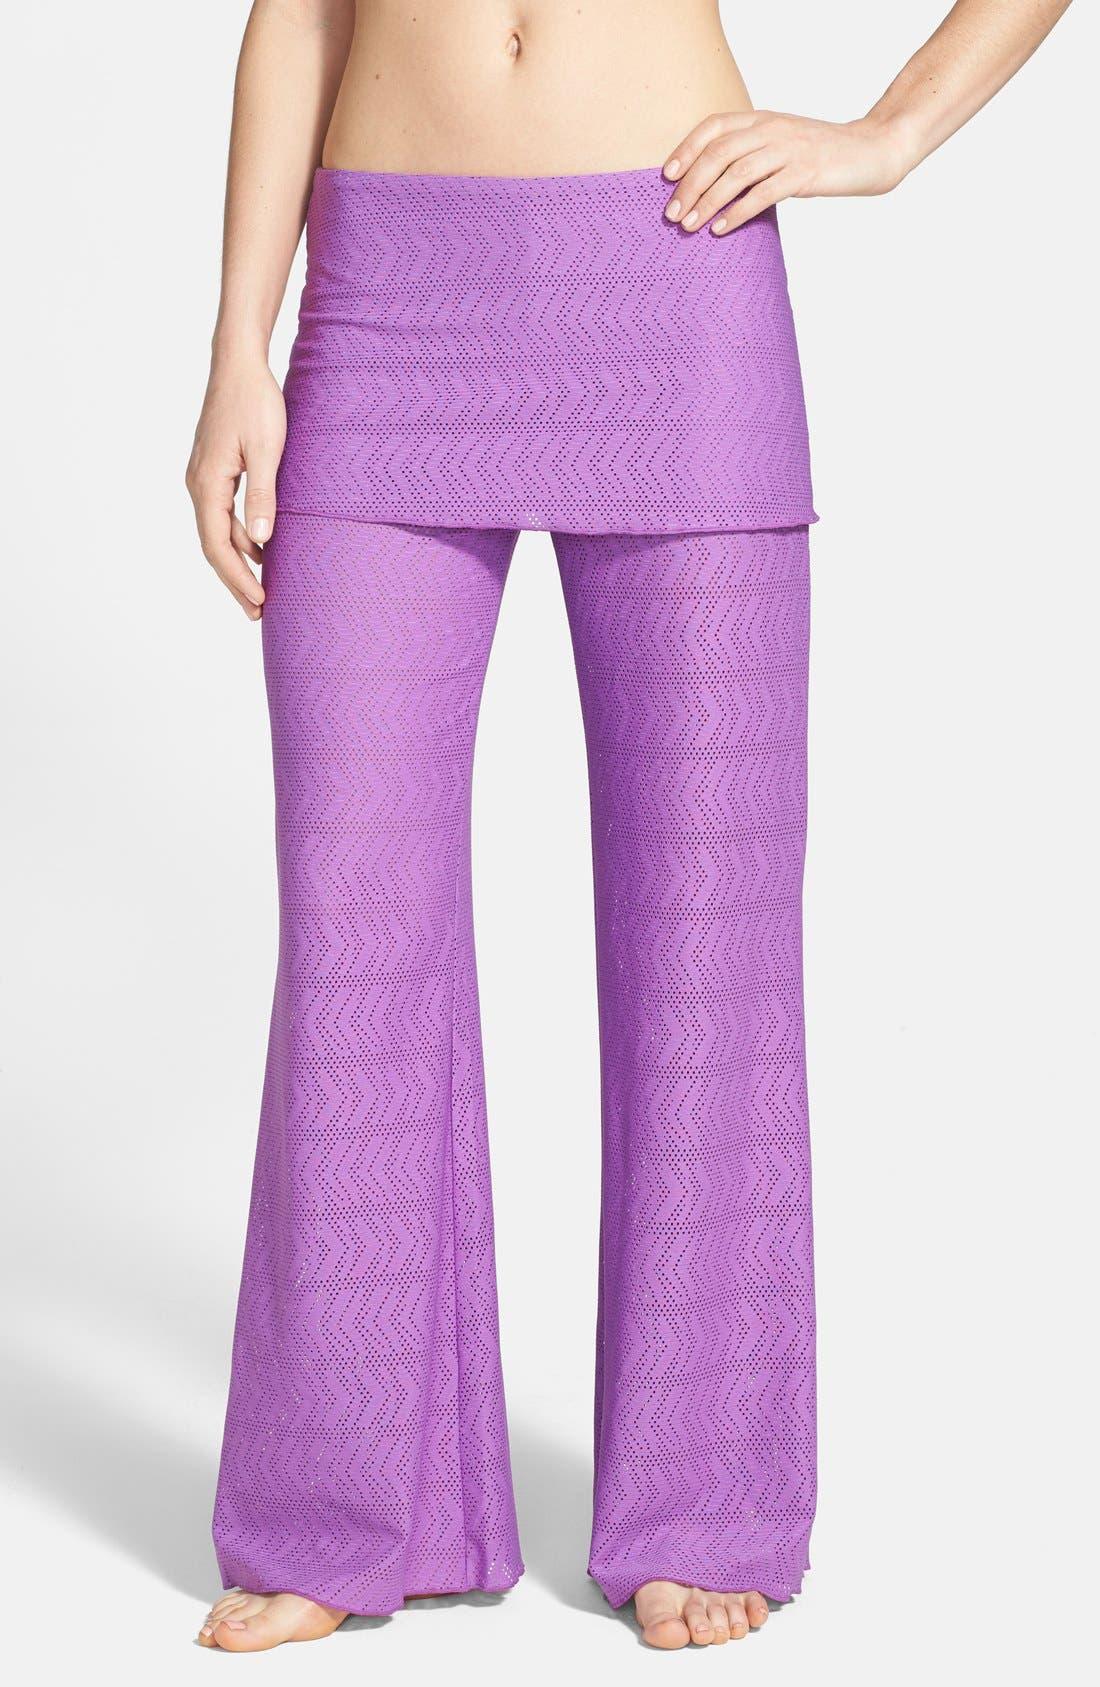 Main Image - prAna 'Satori' Mesh Cover-Up Skirted Pants